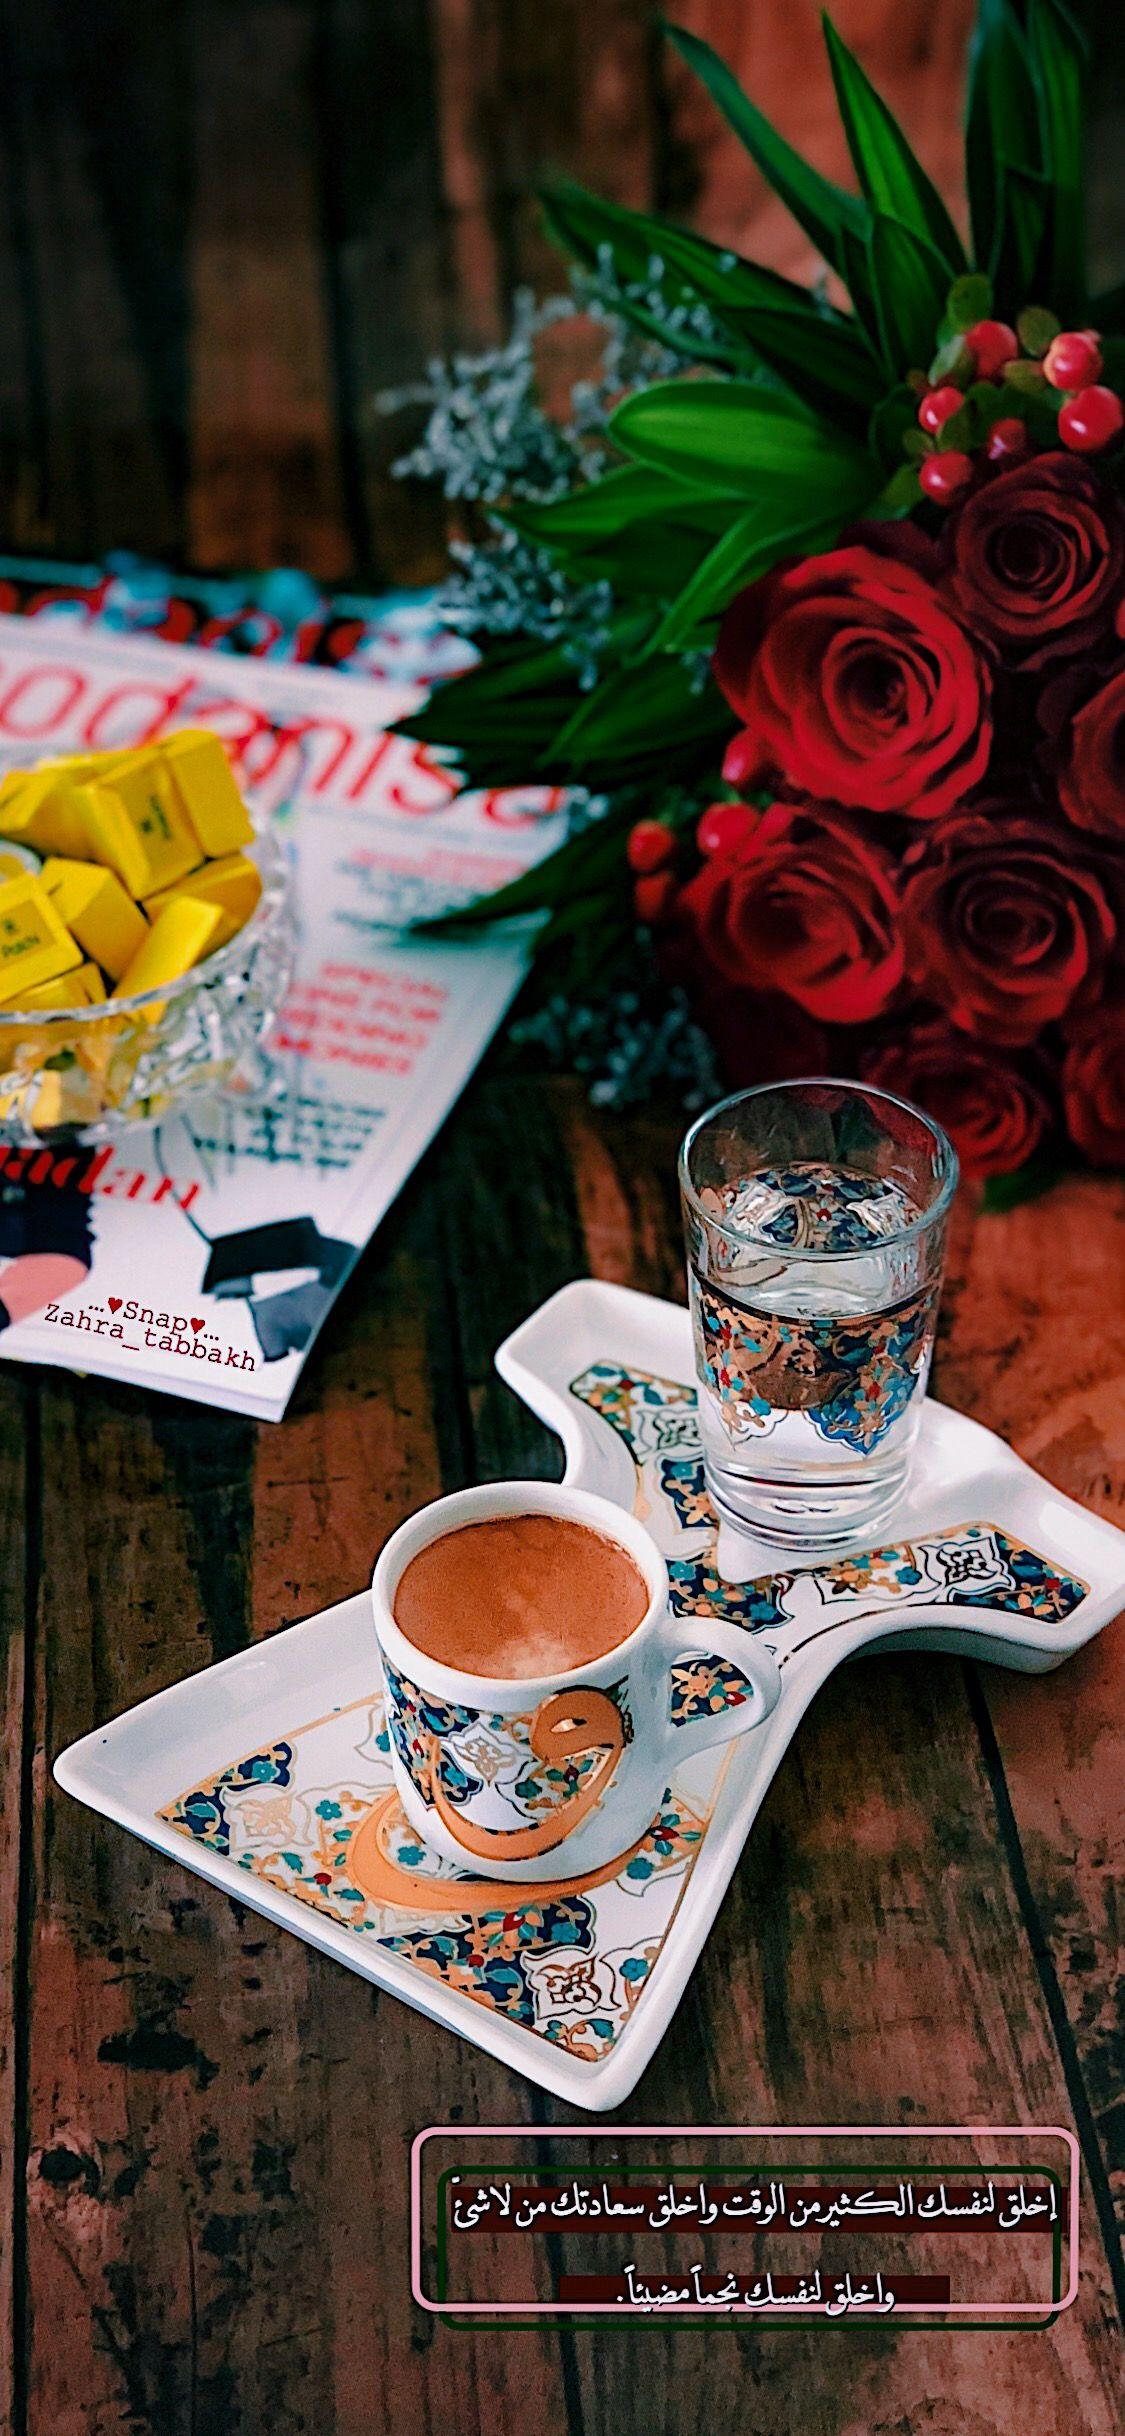 Coffee قهوة قهوتي صباح رمزيات هدوء صباحات Coffee Tea Tea Coffee